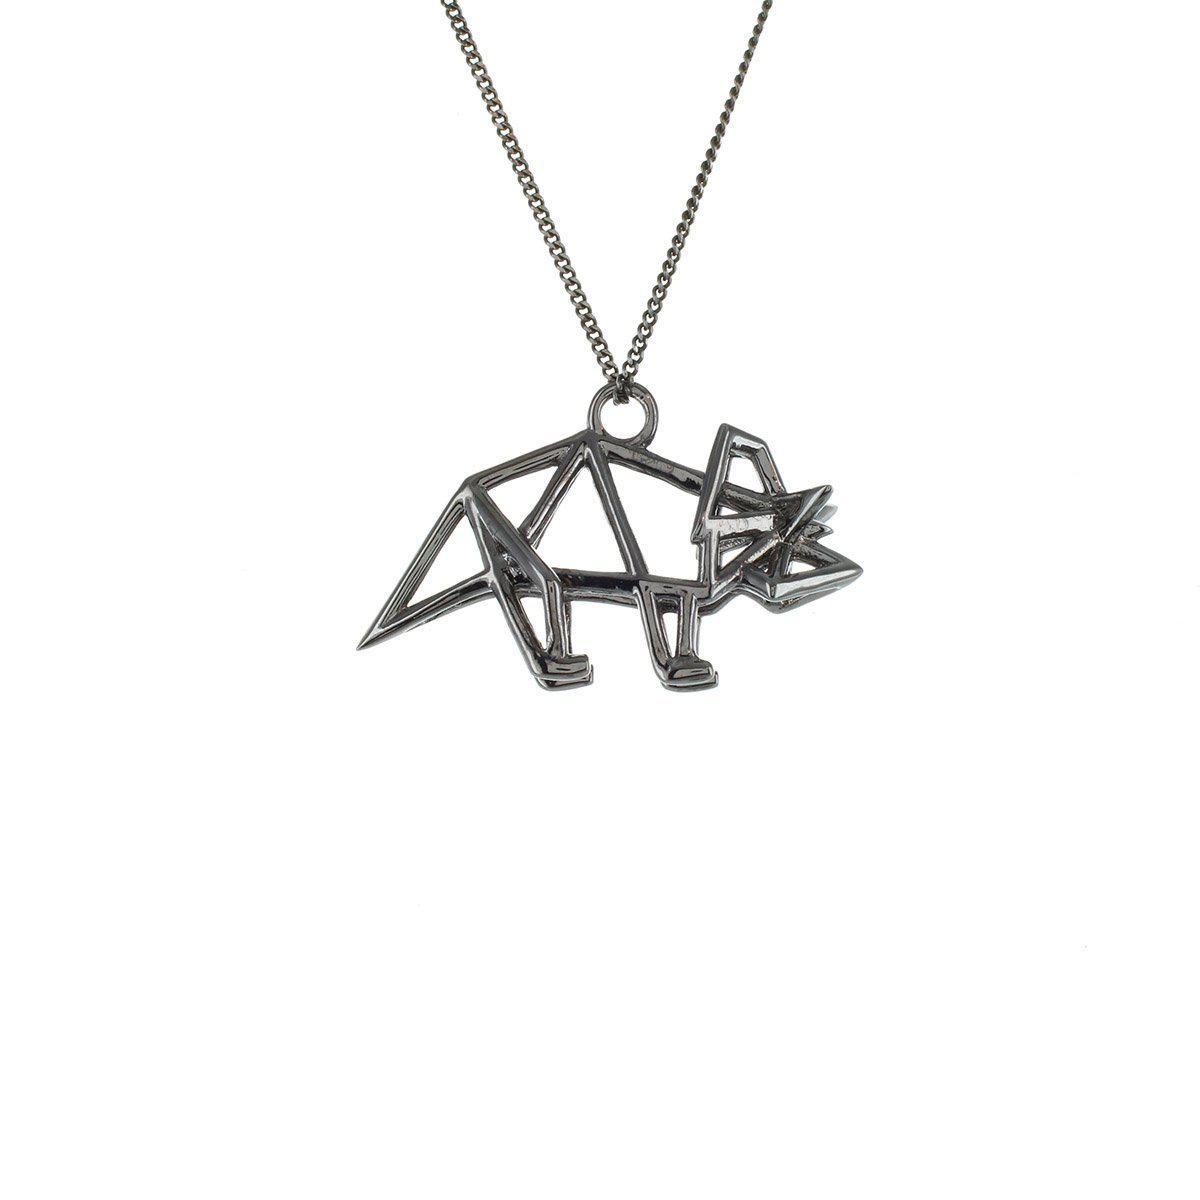 Origami Jewellery Black Silver Mini Triceratop Origami Necklace Ssigudbf